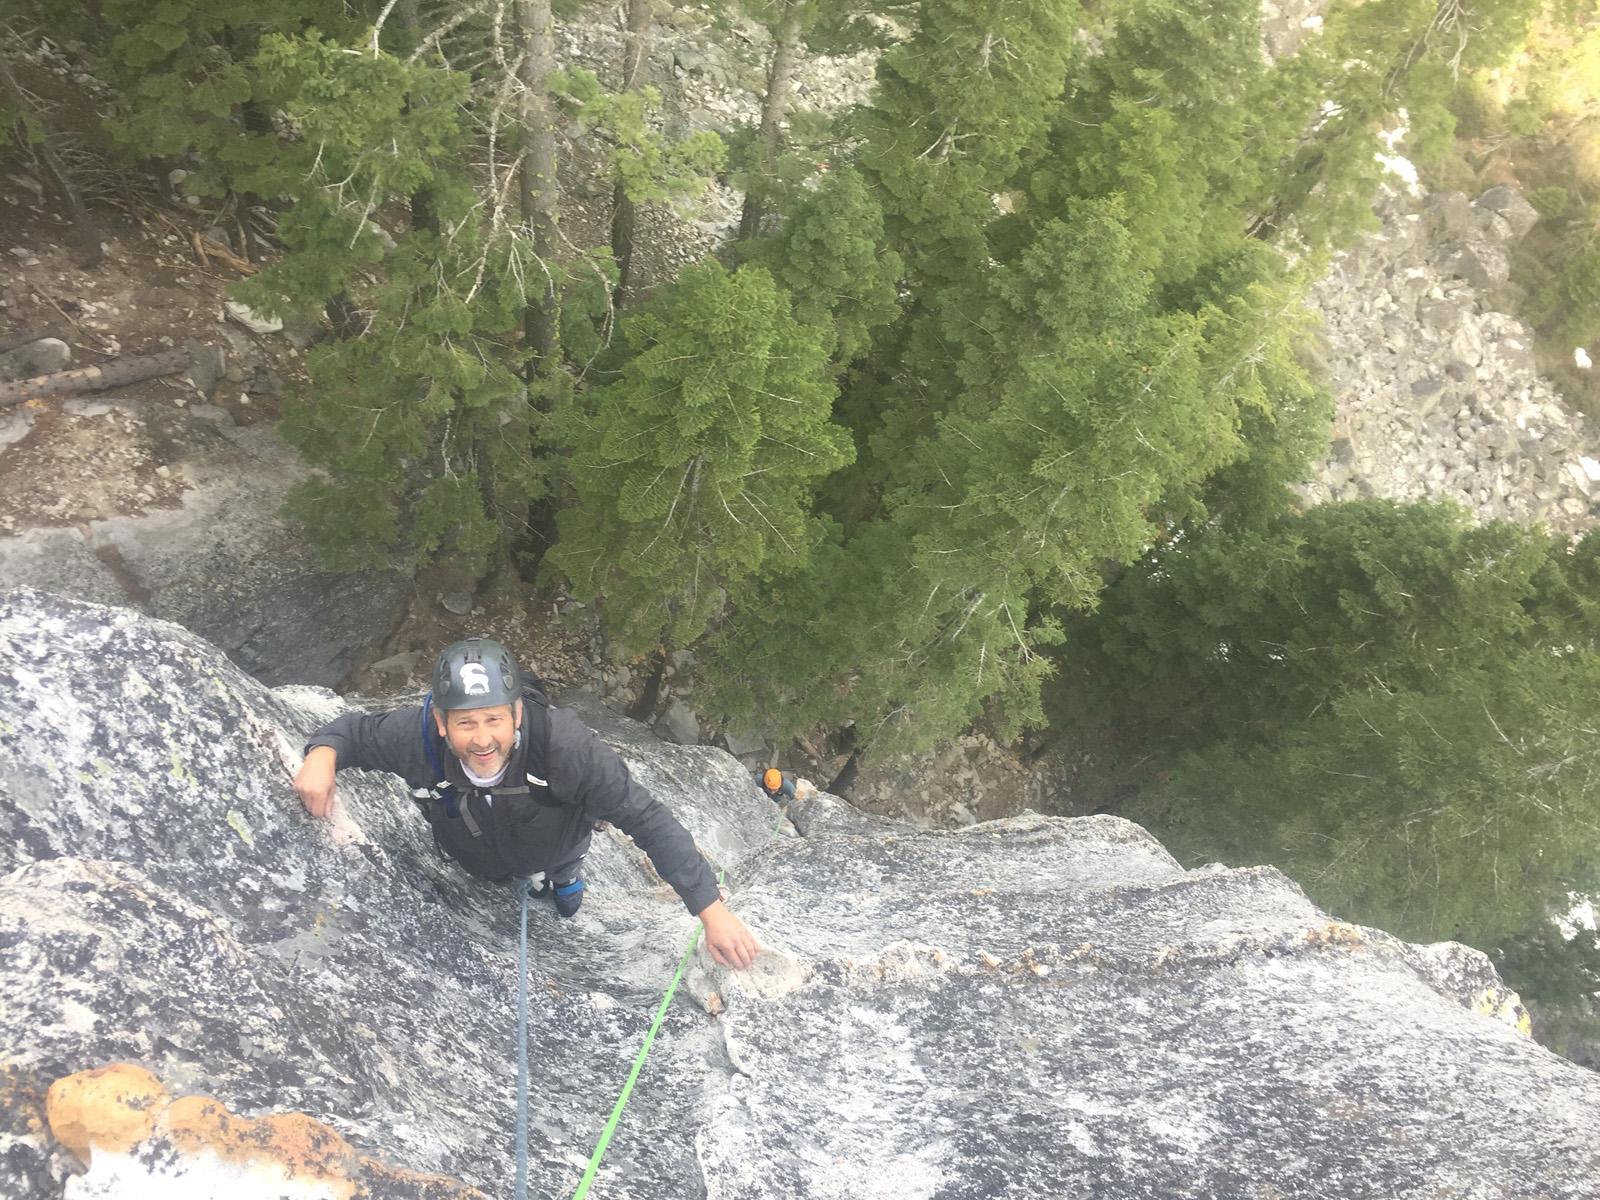 man in black helmet rock climbing